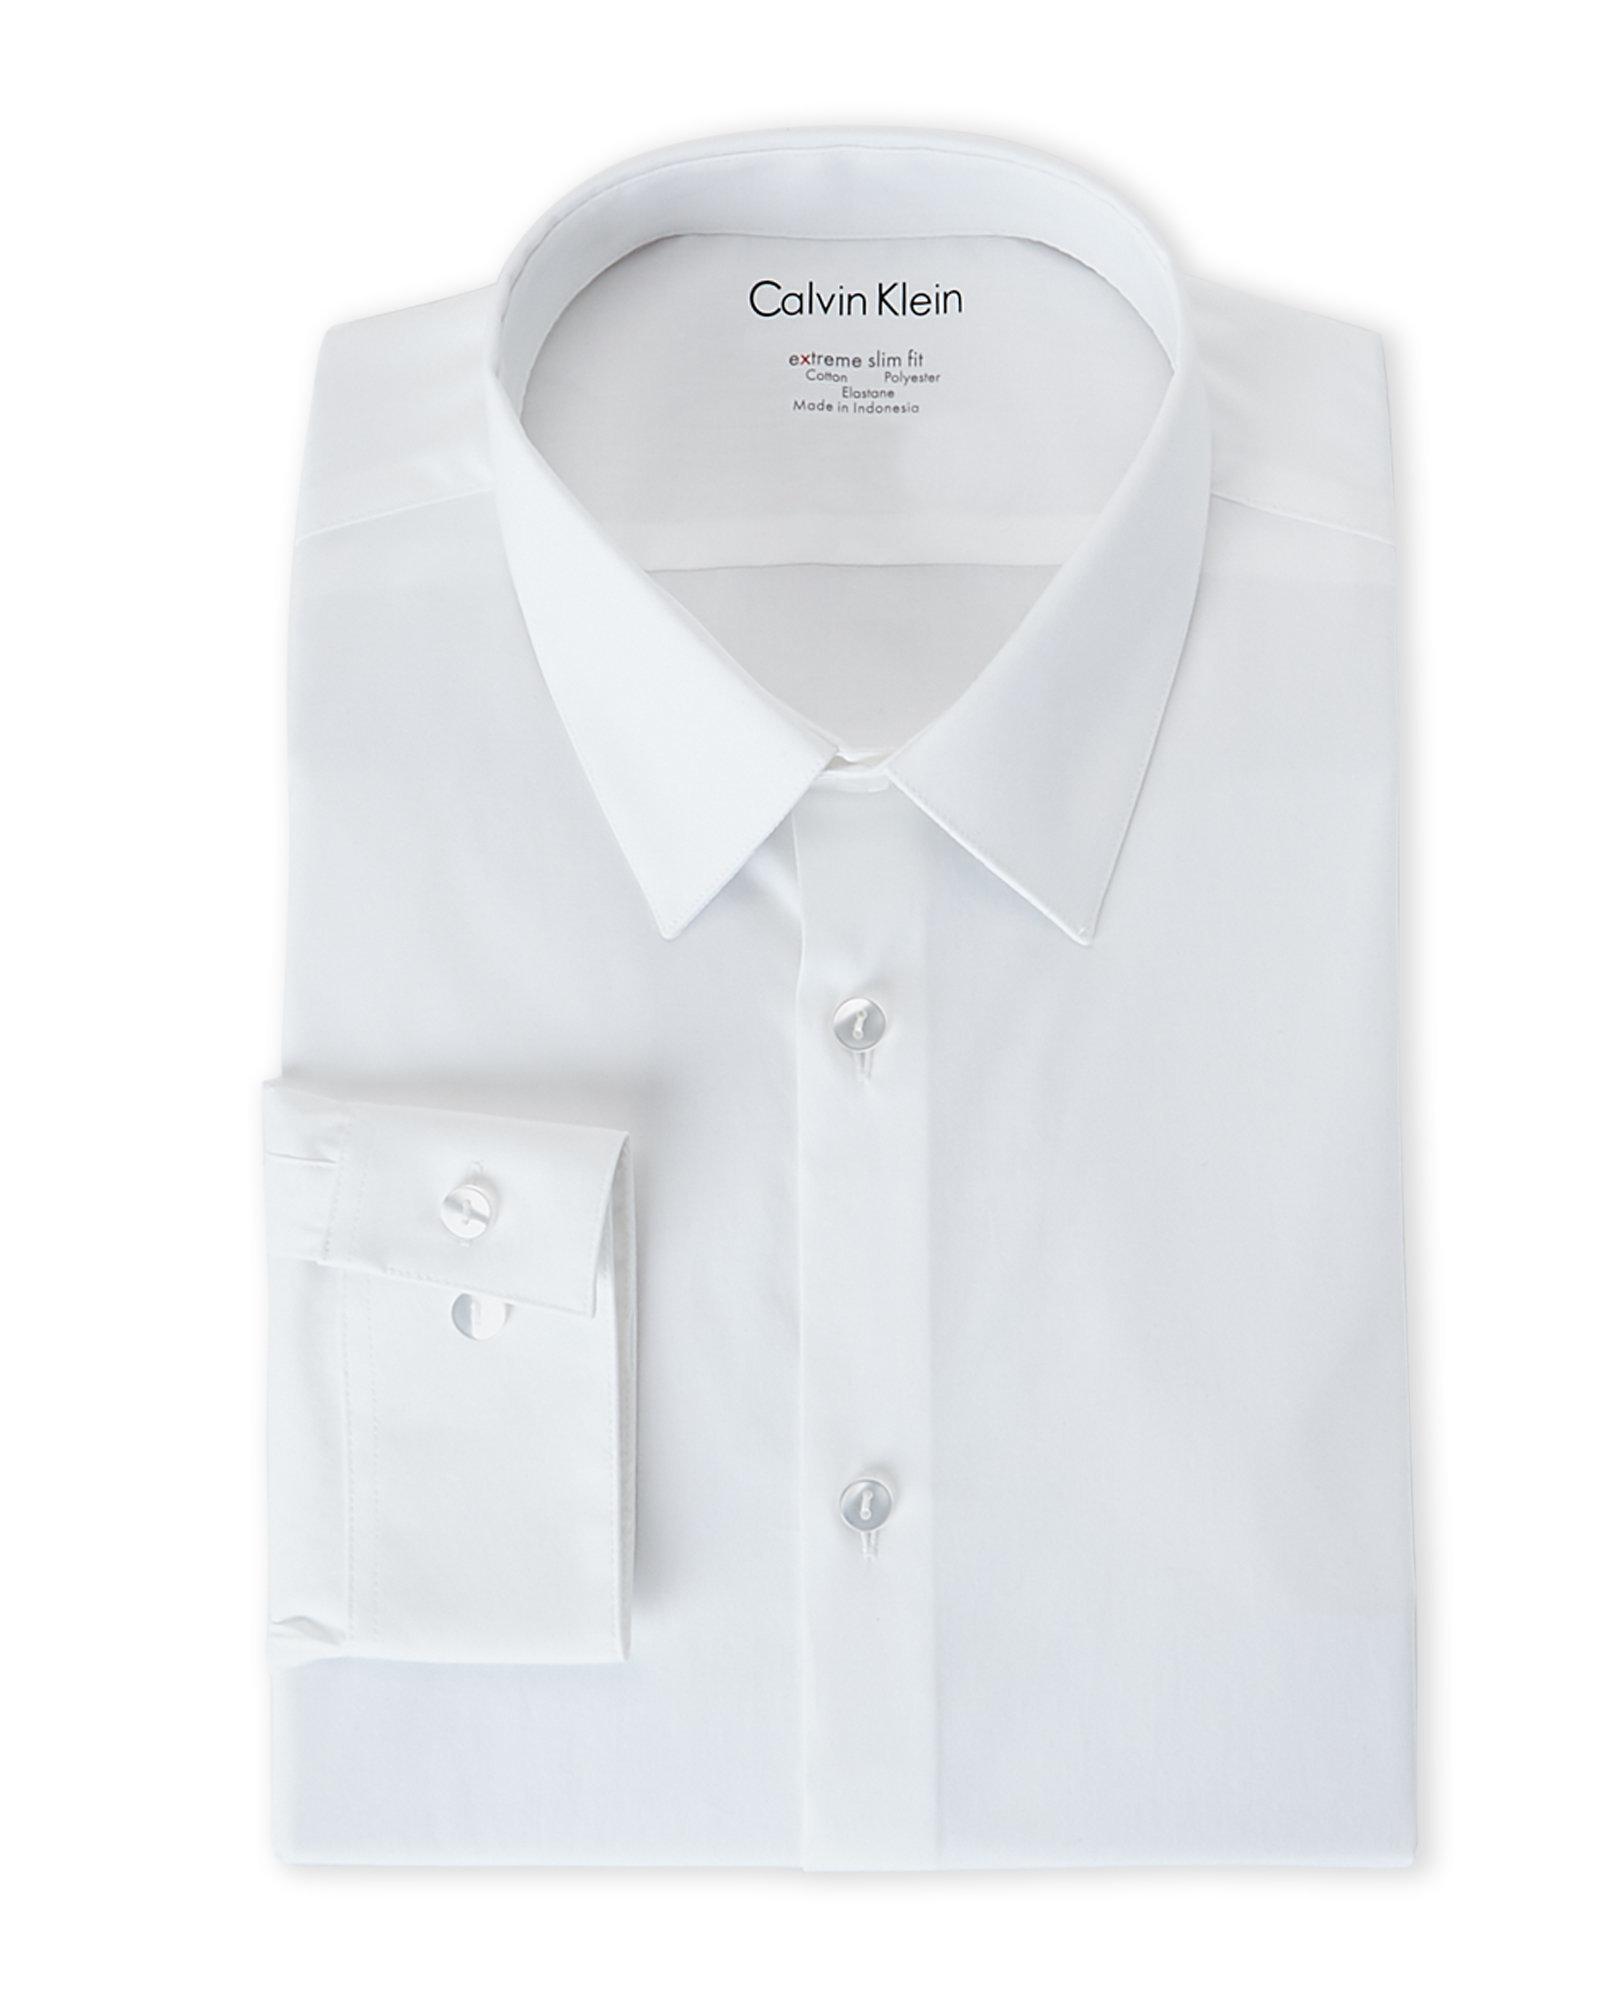 fa7a5495688 Calvin Klein Steel Mens Slim Fit French Cuff Tuxedo Shirt